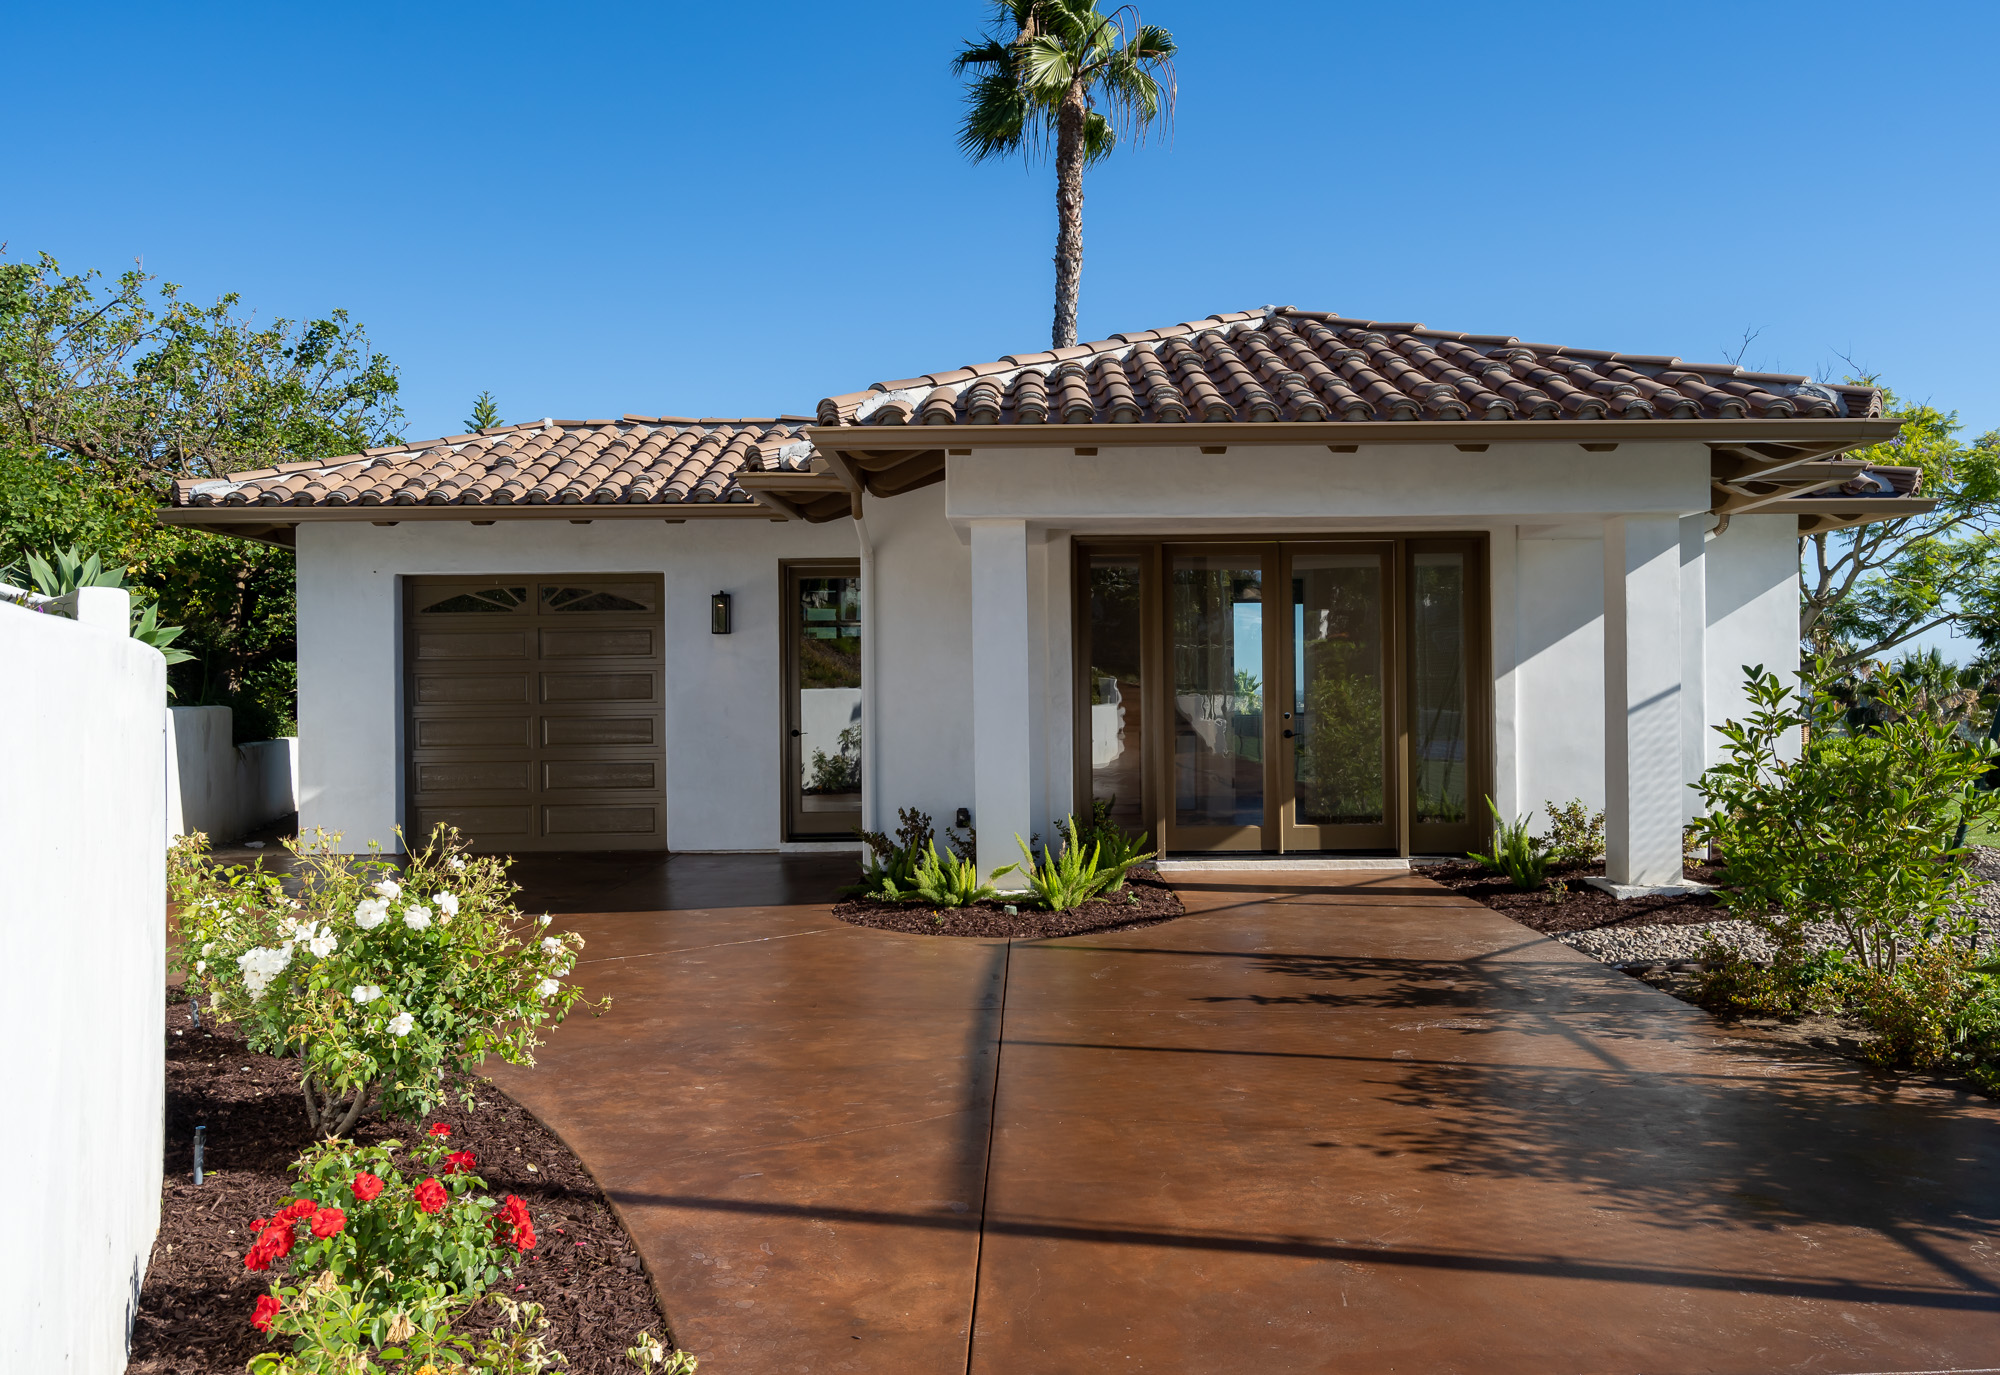 7499 Vista Rancho Ct -  Rancho Santa Fe, CA 92091